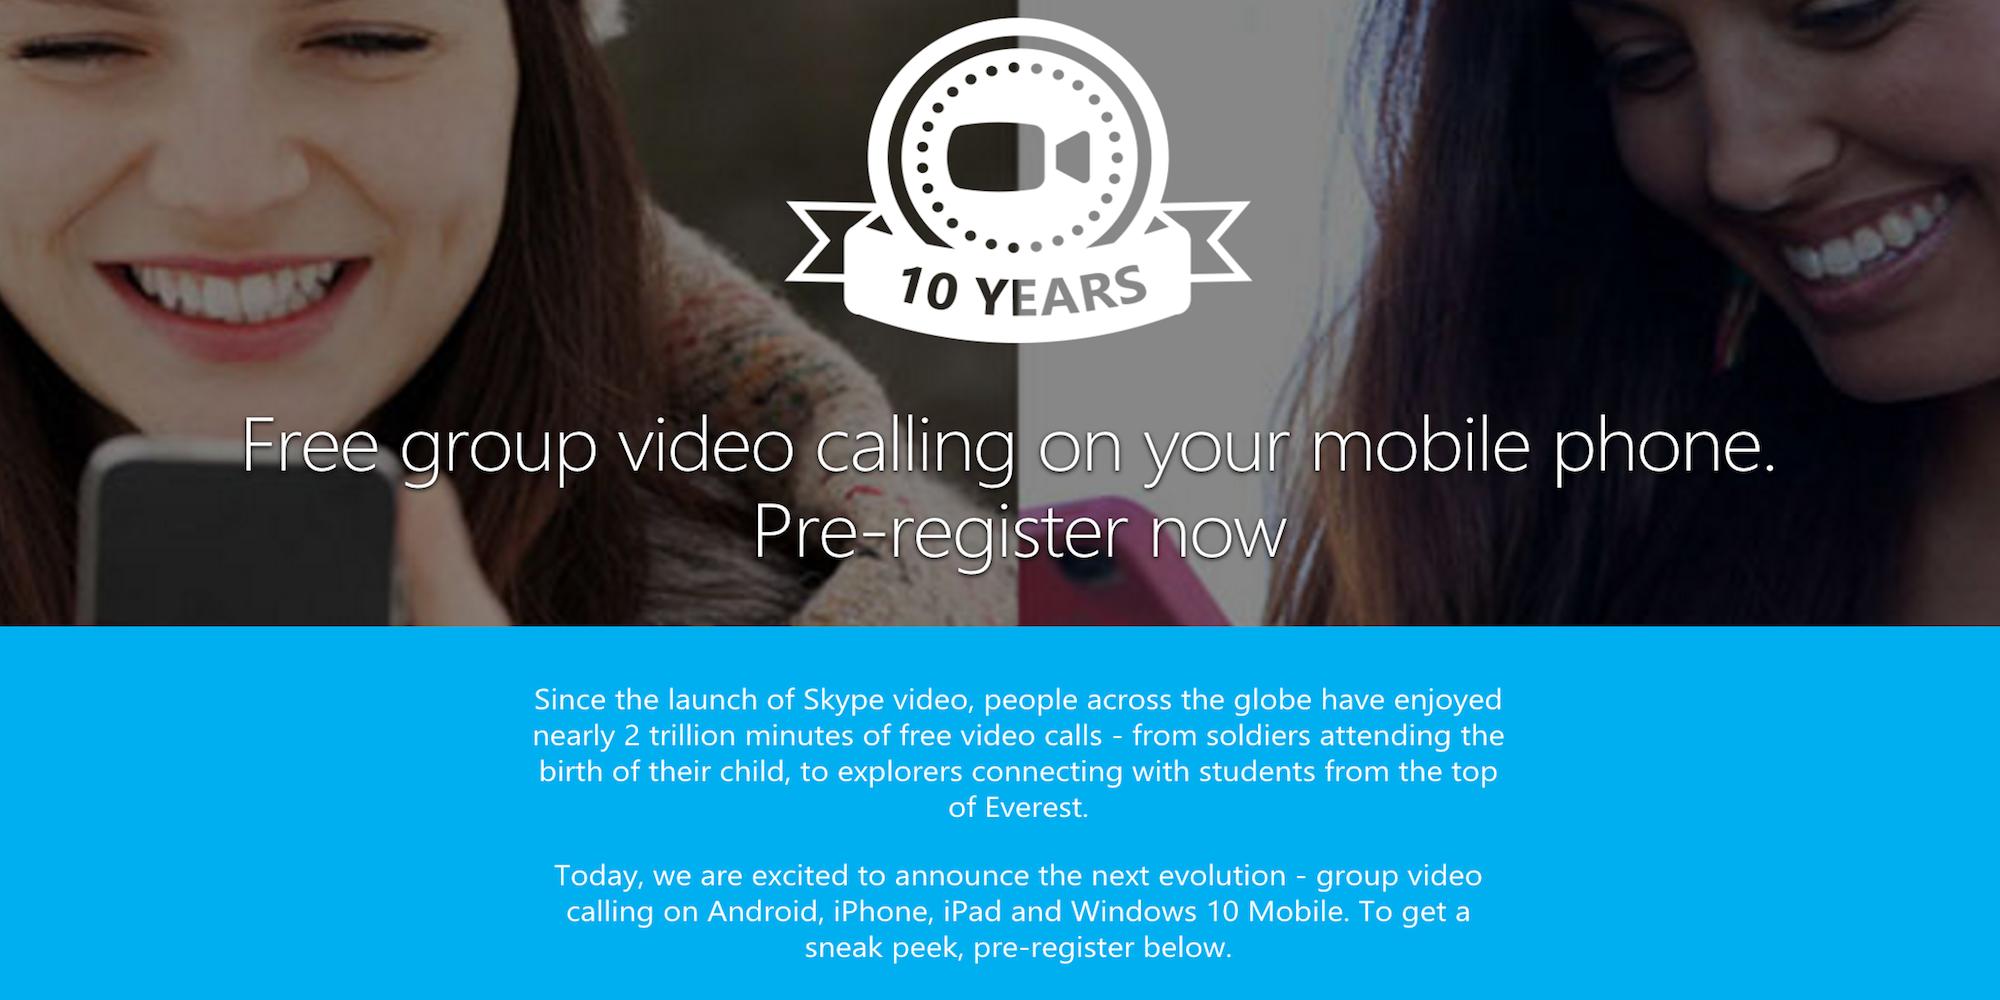 Skype-group-video-calling